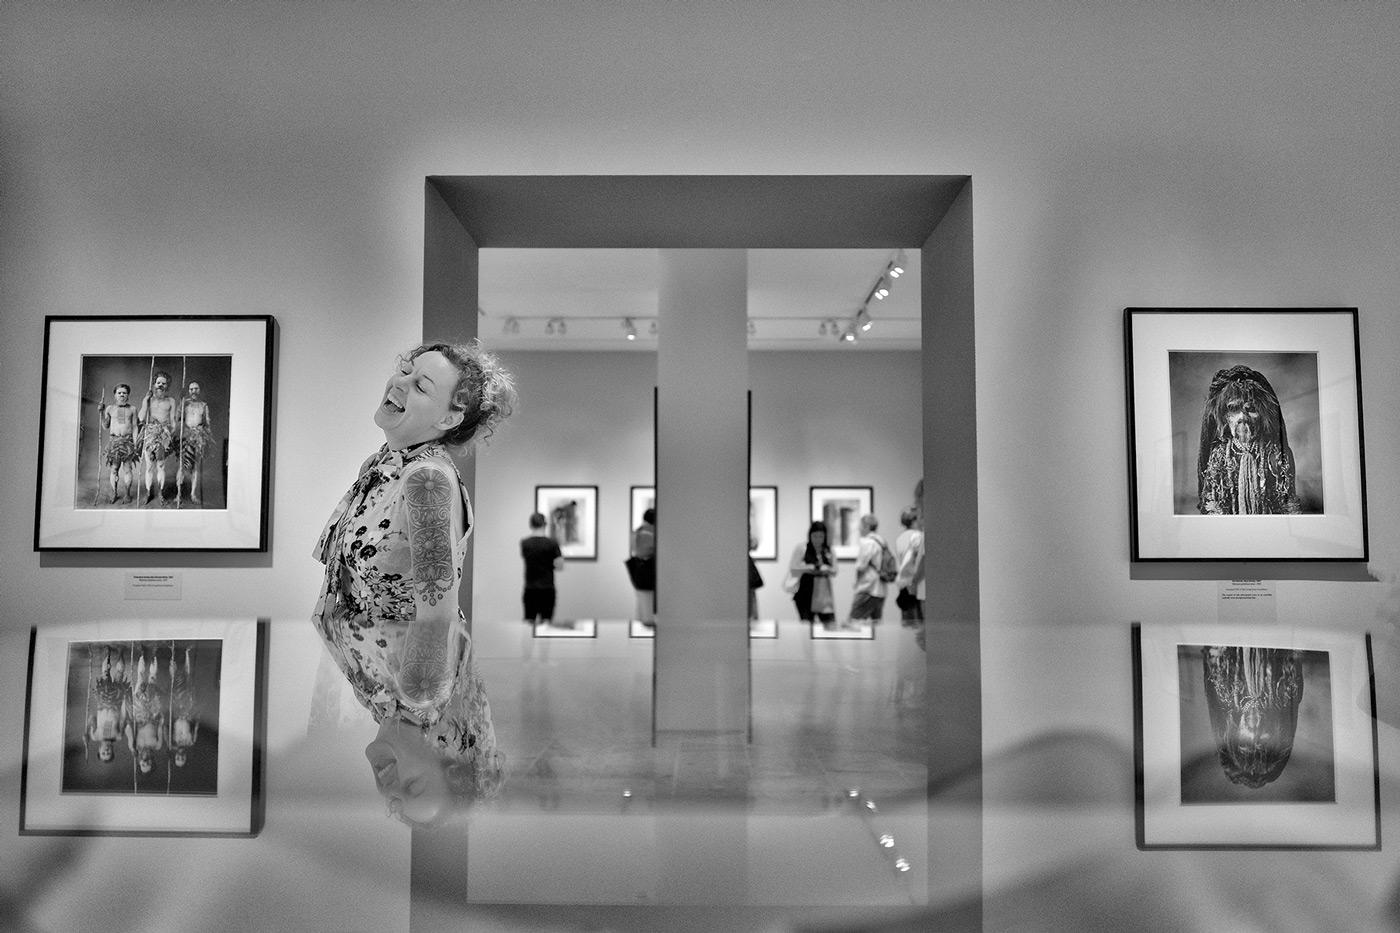 William-Bullard_USA_Pictures-at-an-Exhibition_20.jpeg